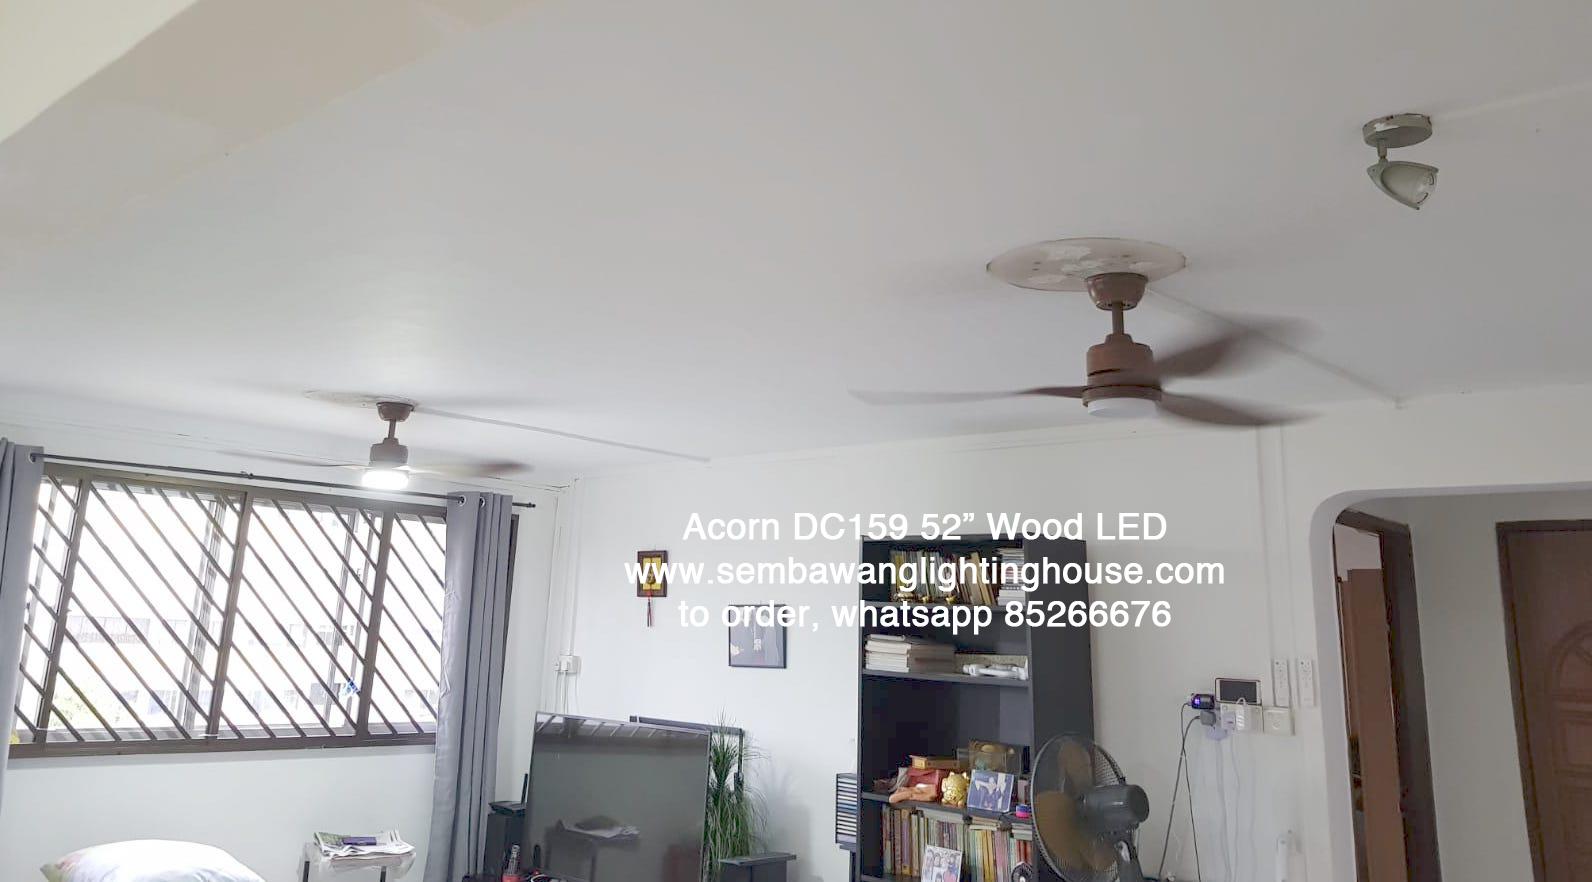 sample01-acorn-dc159-52-wood-ceiling-fan-semabawang-lighting-house.jpg